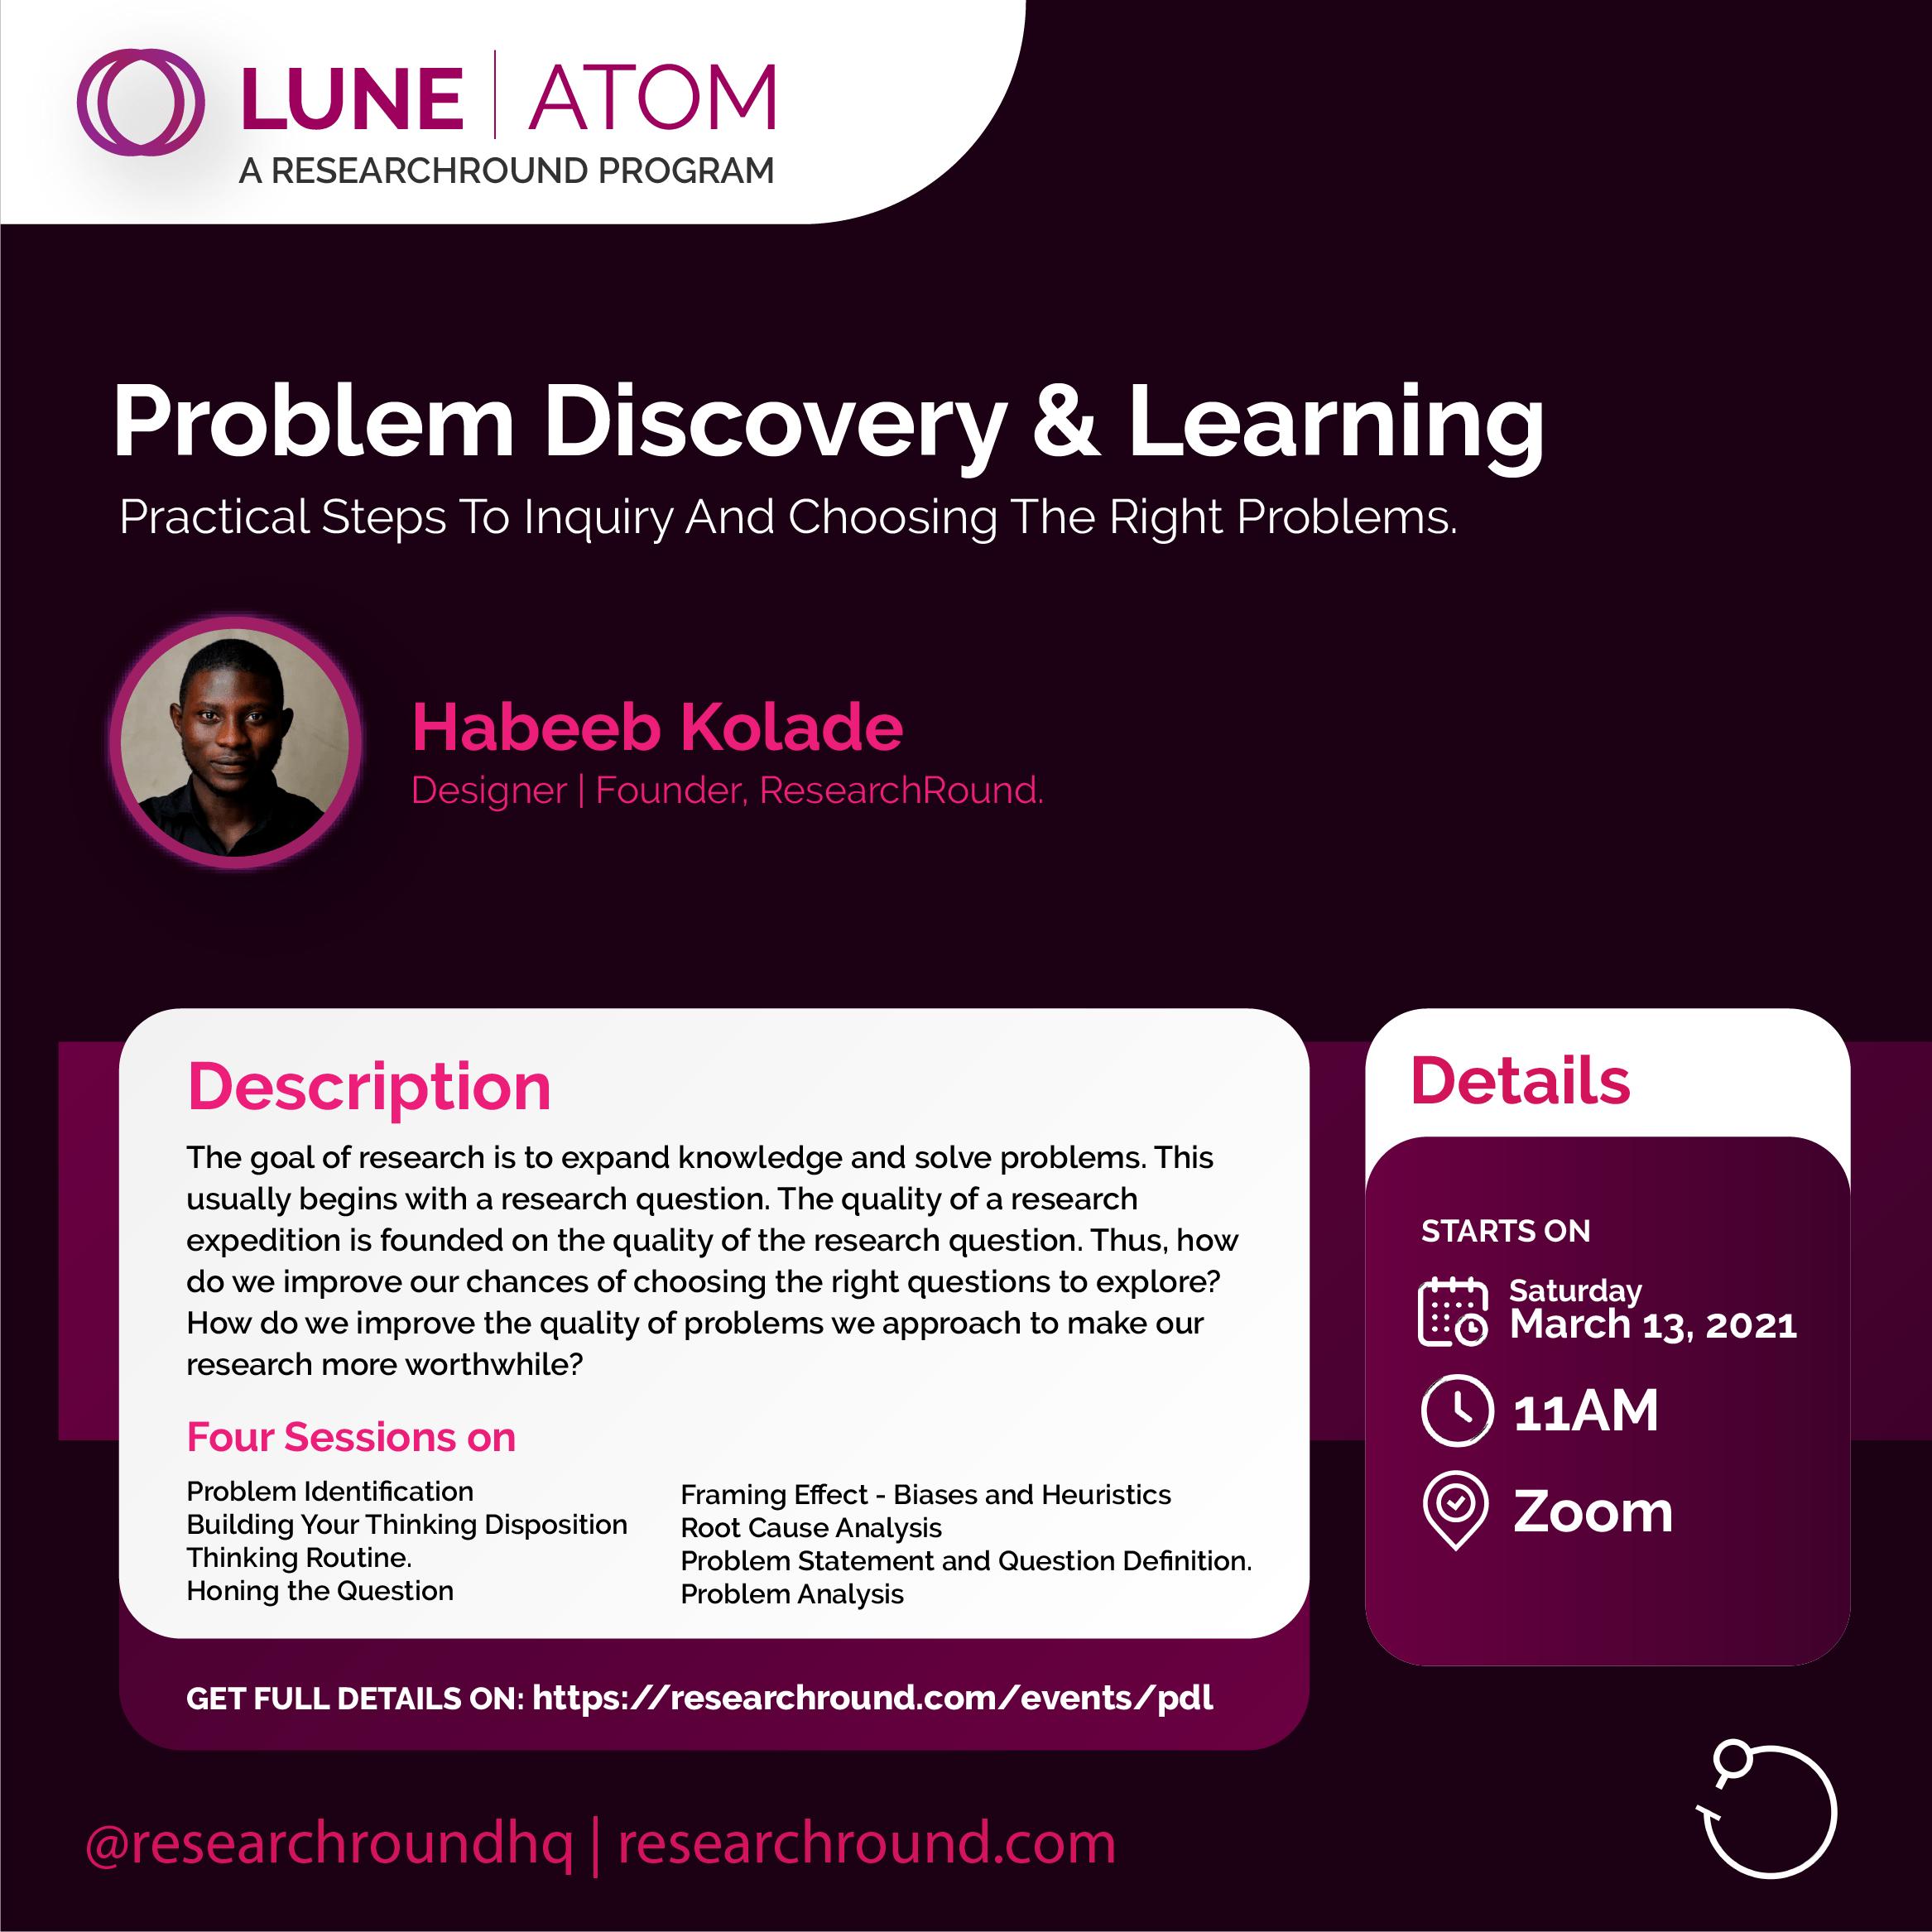 LUNE ATOM | RESEARCHROUND | HABEEB KOLADE